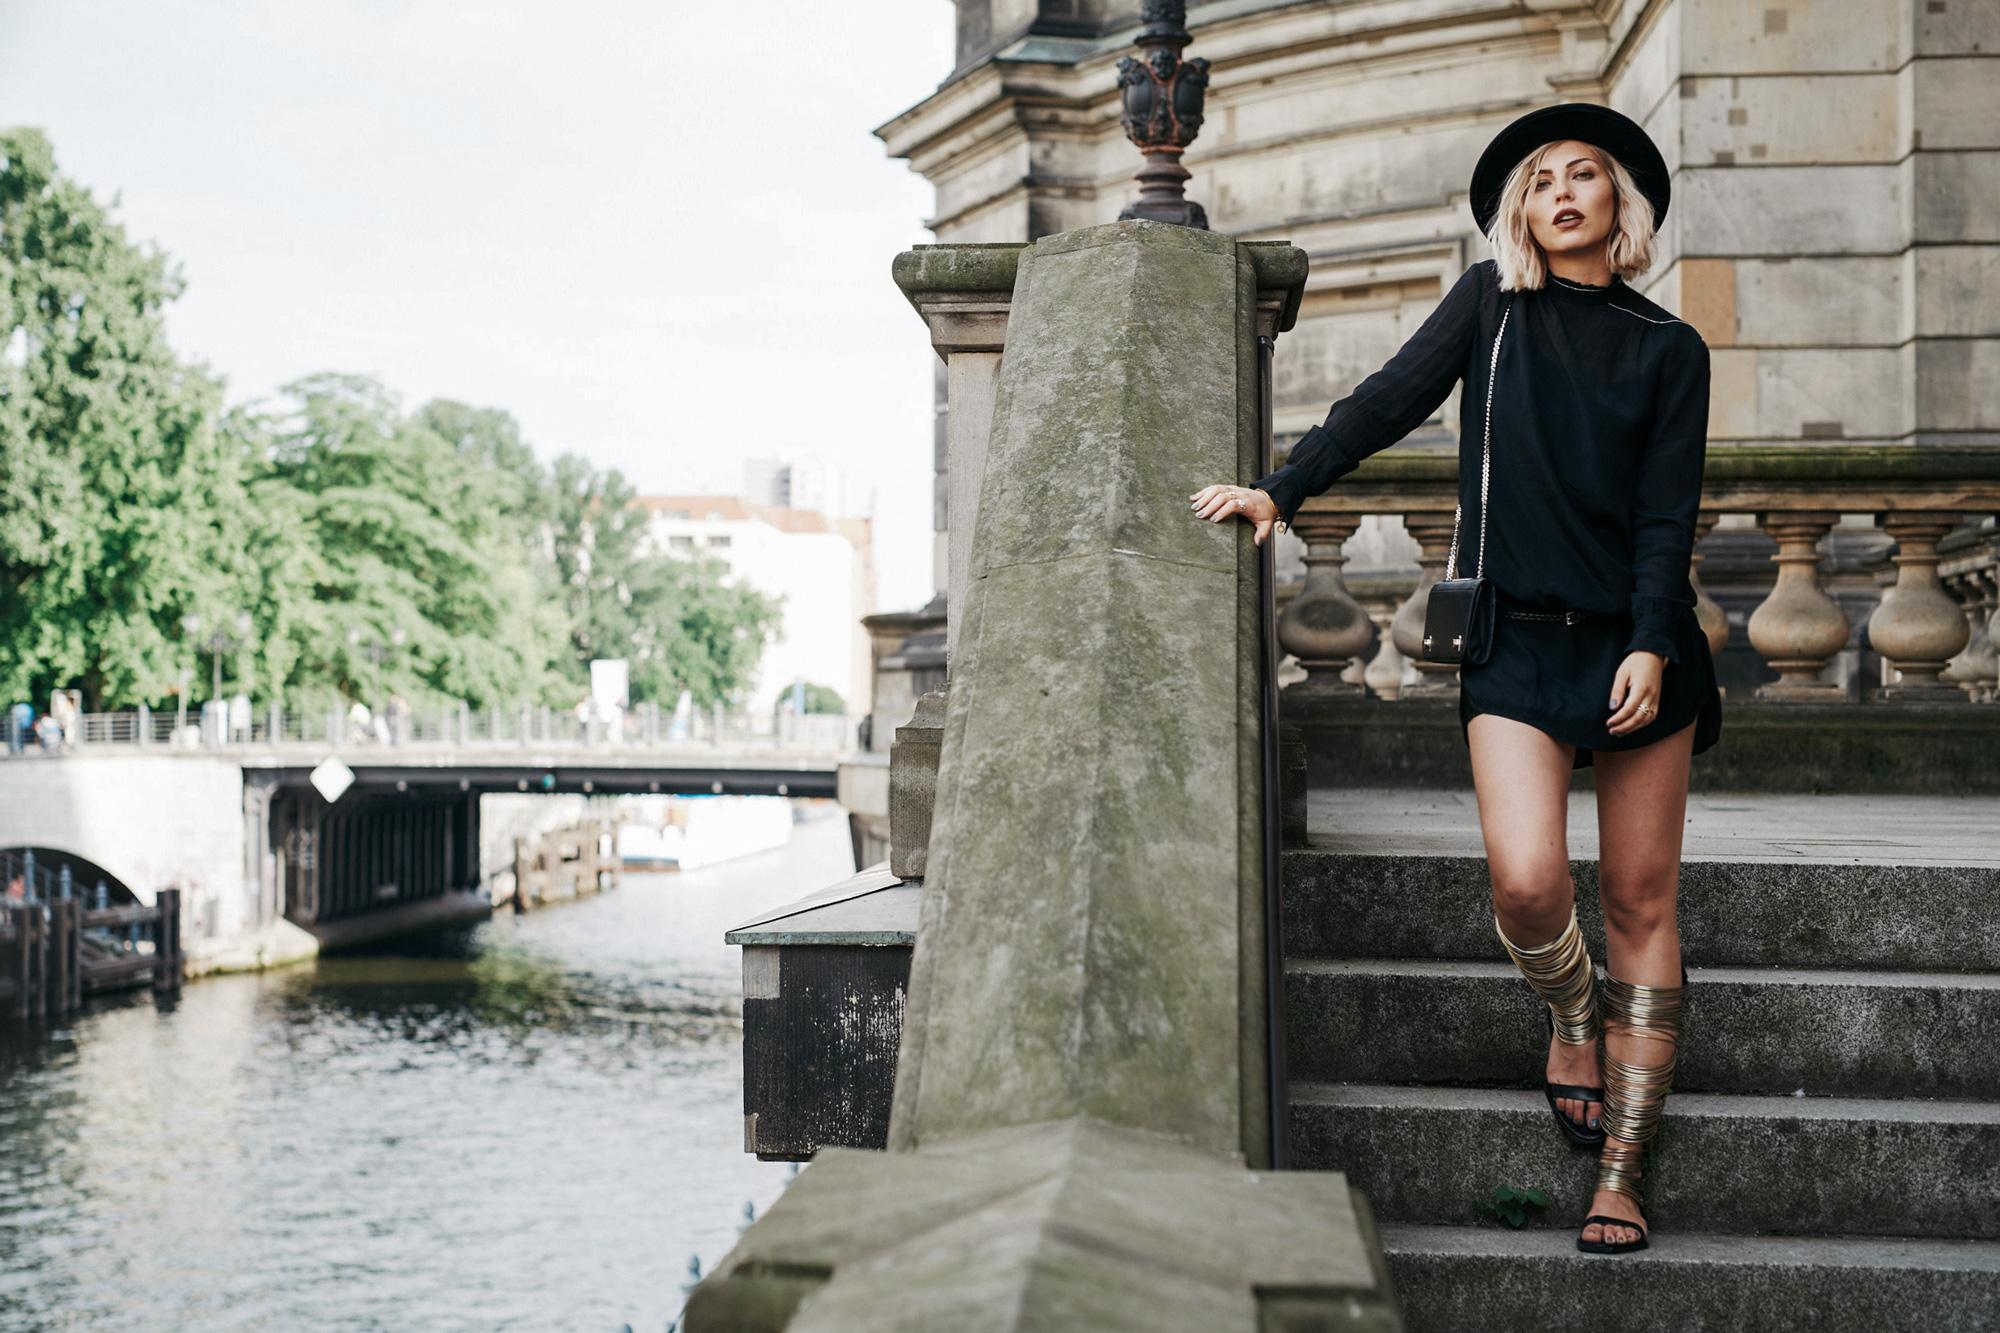 the little black dress from Baum & Pferdgarten, a scandinavian designer   style: edgy, boho, chic   vic matie metal sandals   find more pictures on my blog